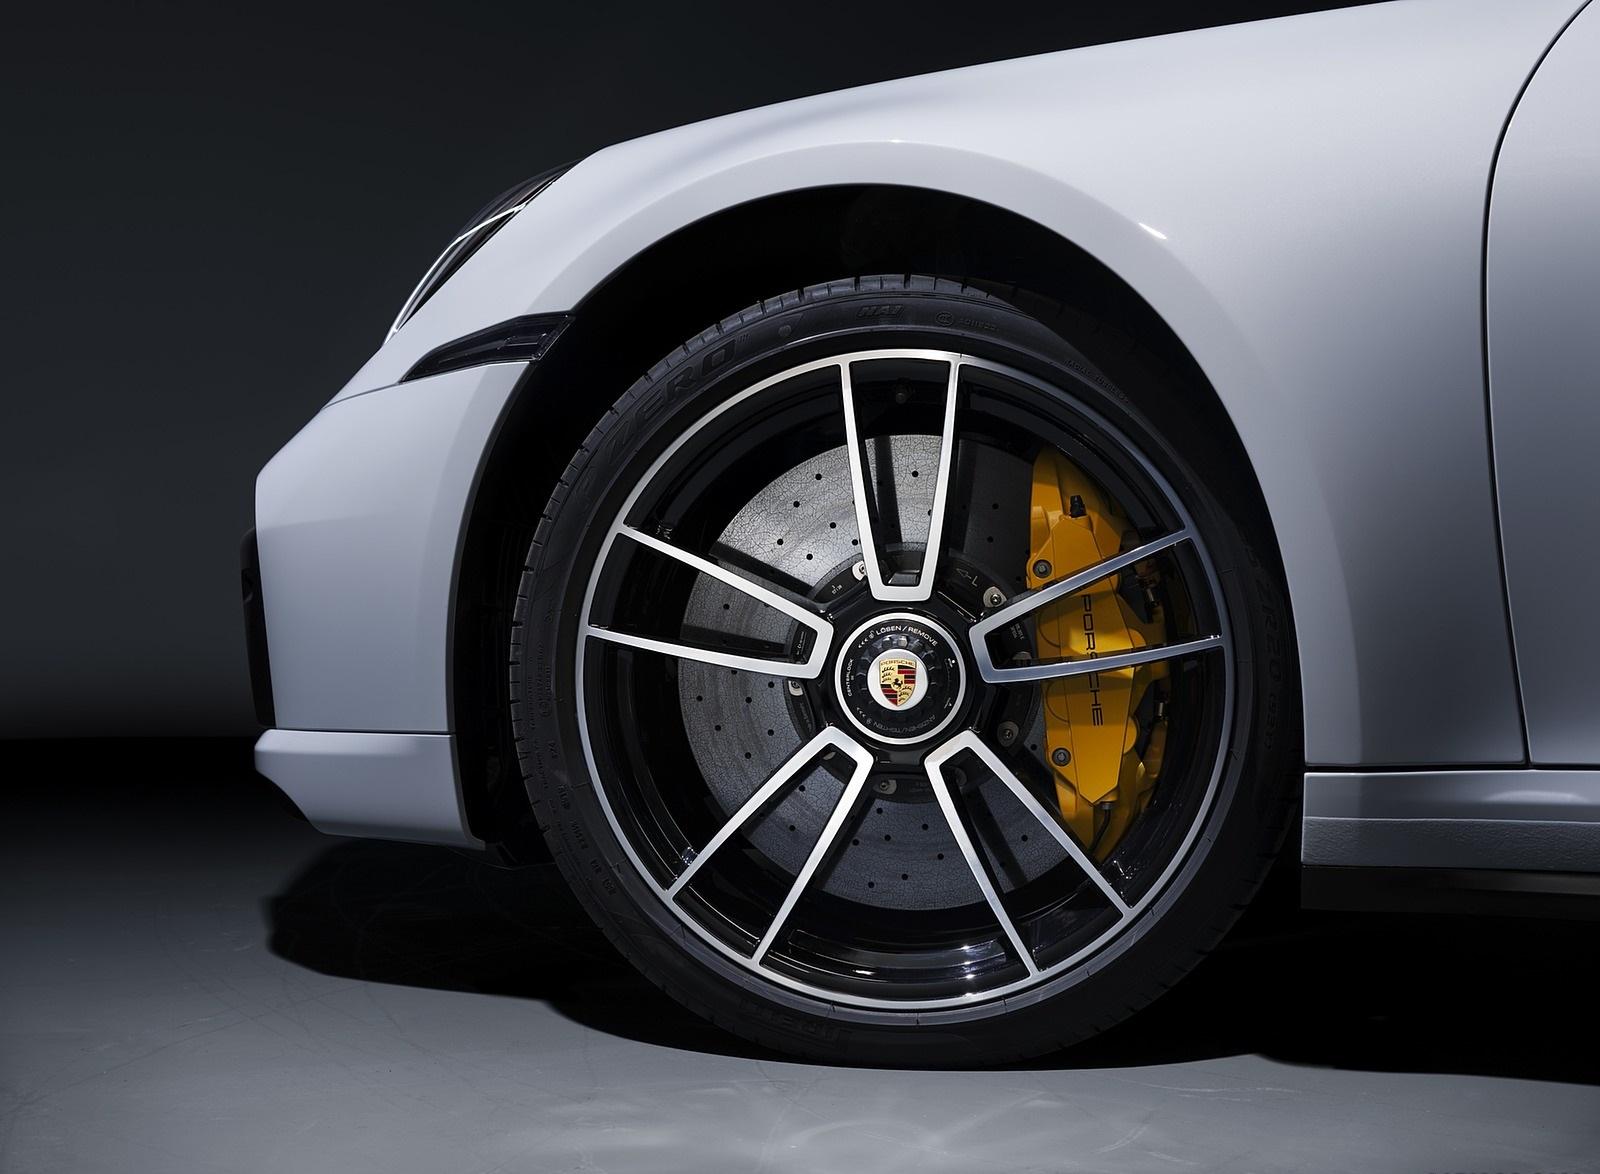 2021 Porsche 911 Turbo S Cabriolet Wheel Wallpapers (5)